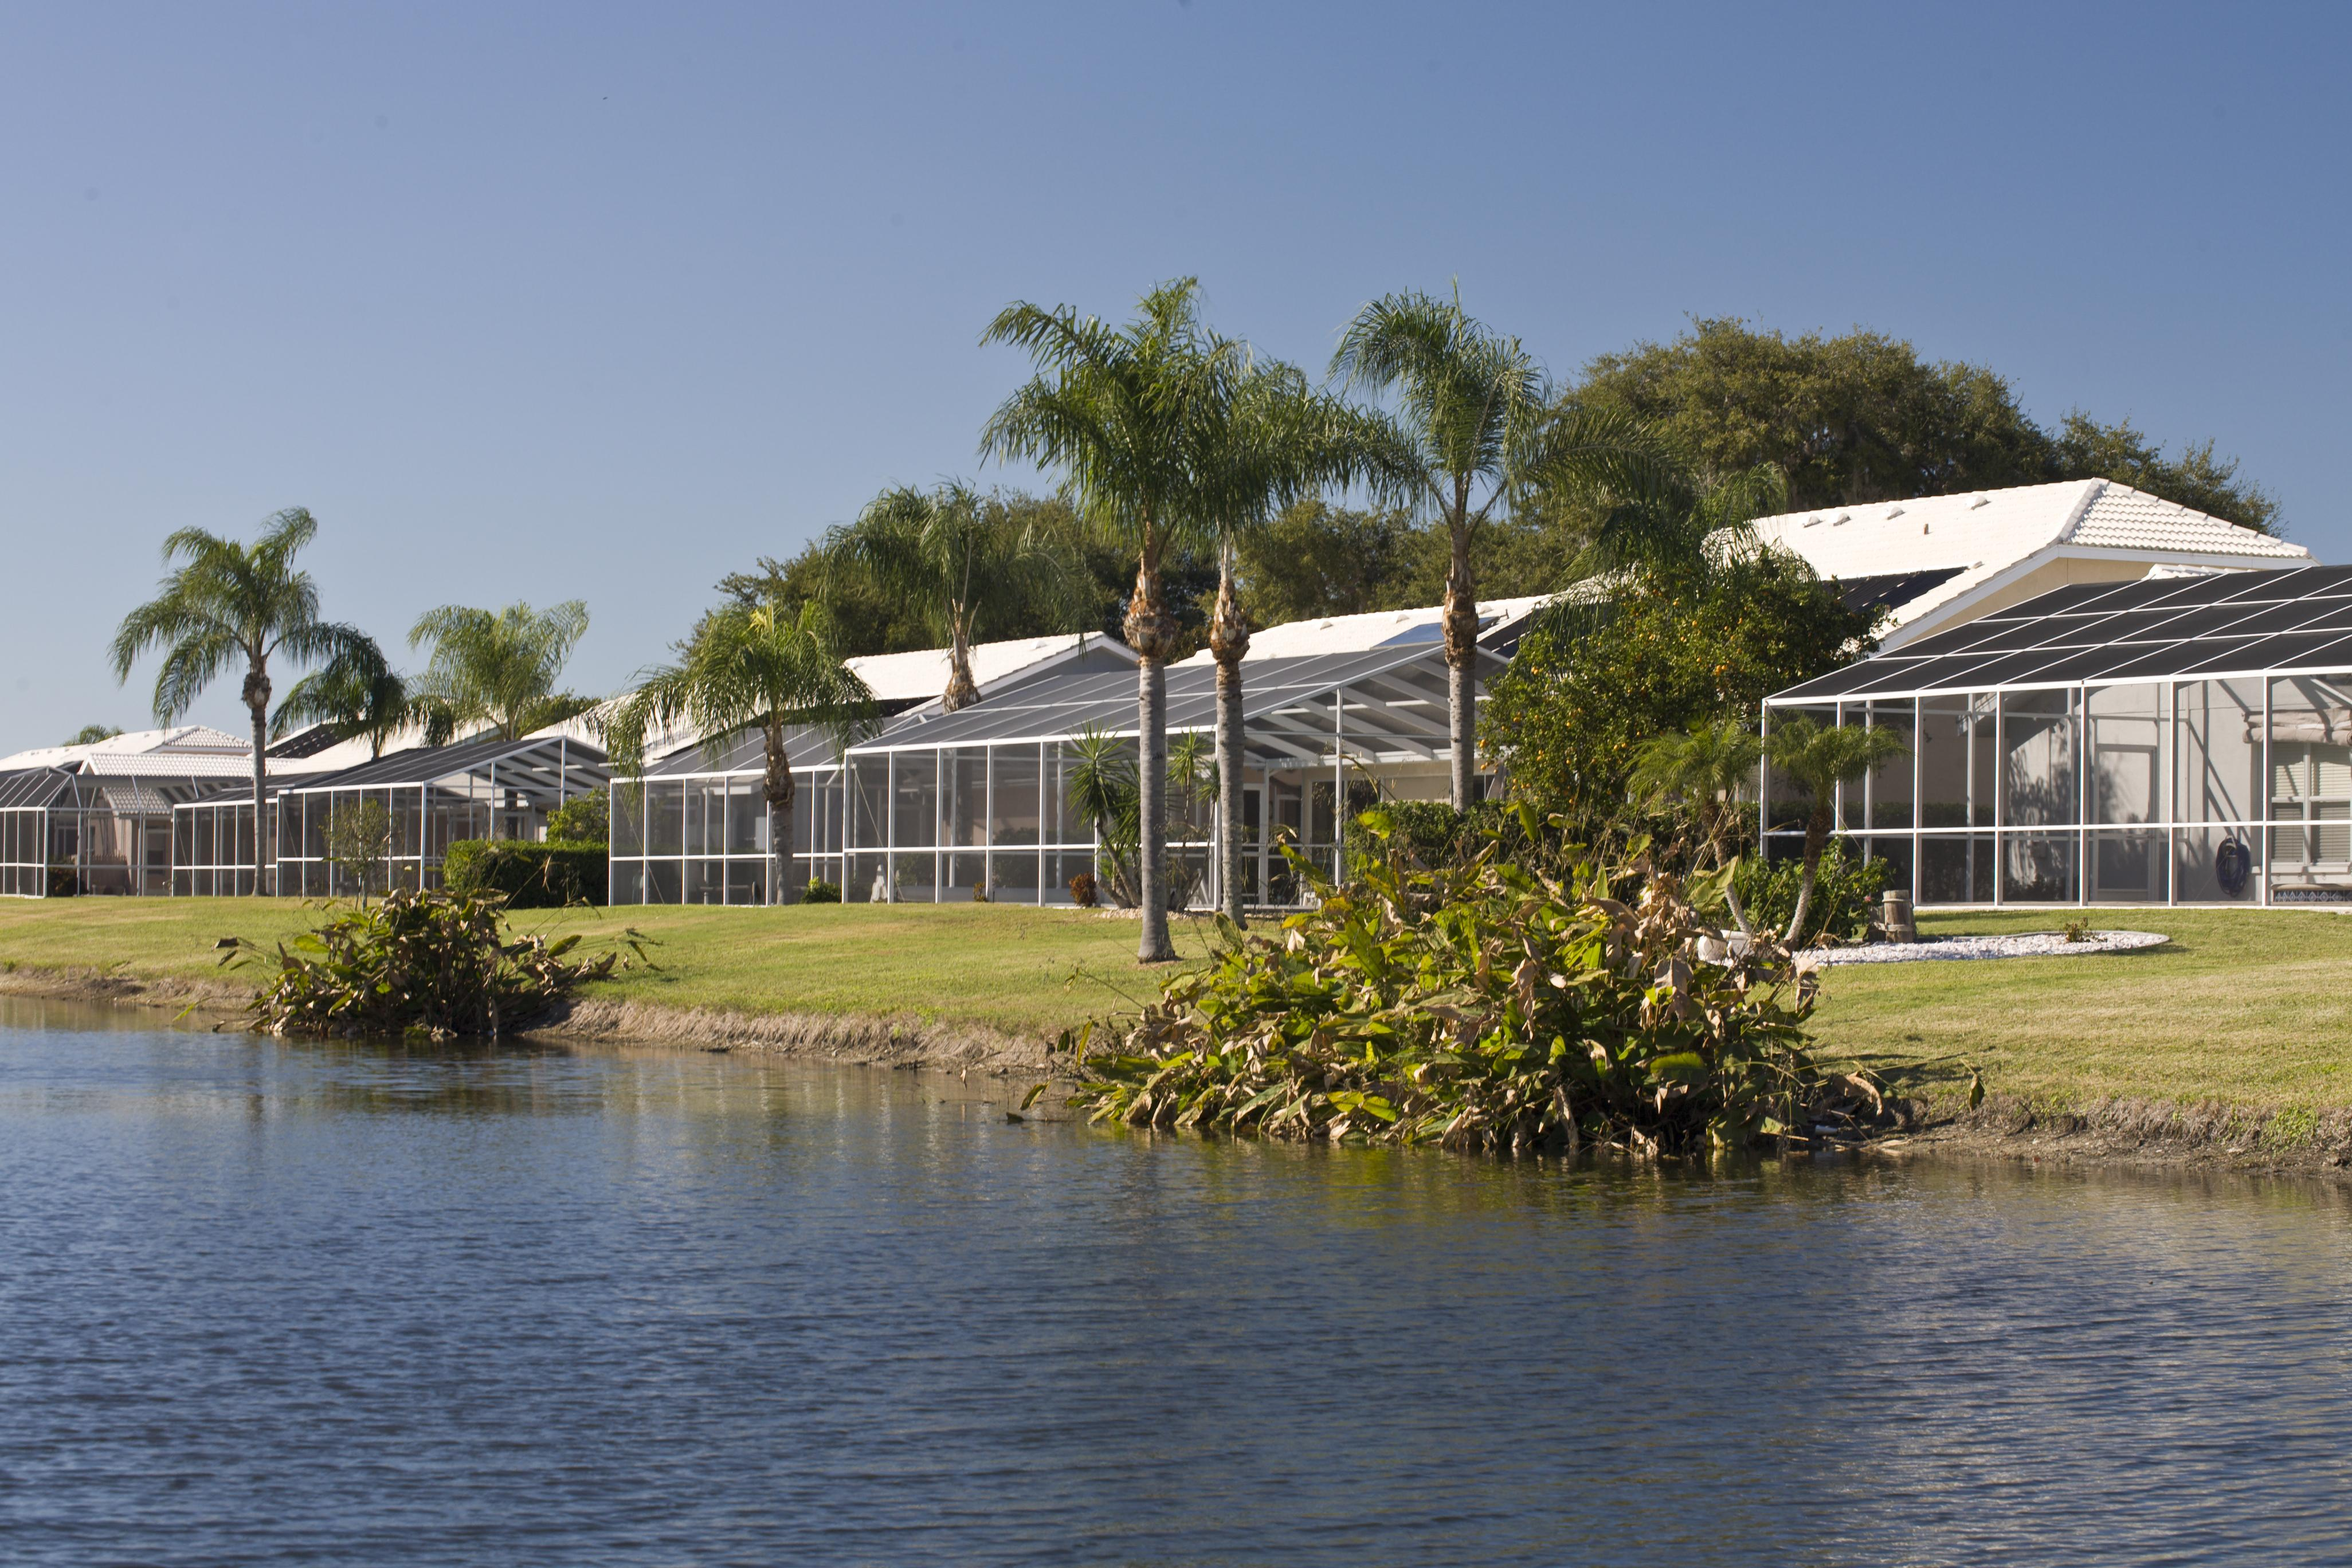 Cursos cortos para aprender a cultivar un jardin de for Aquatic sport center jardin balbuena